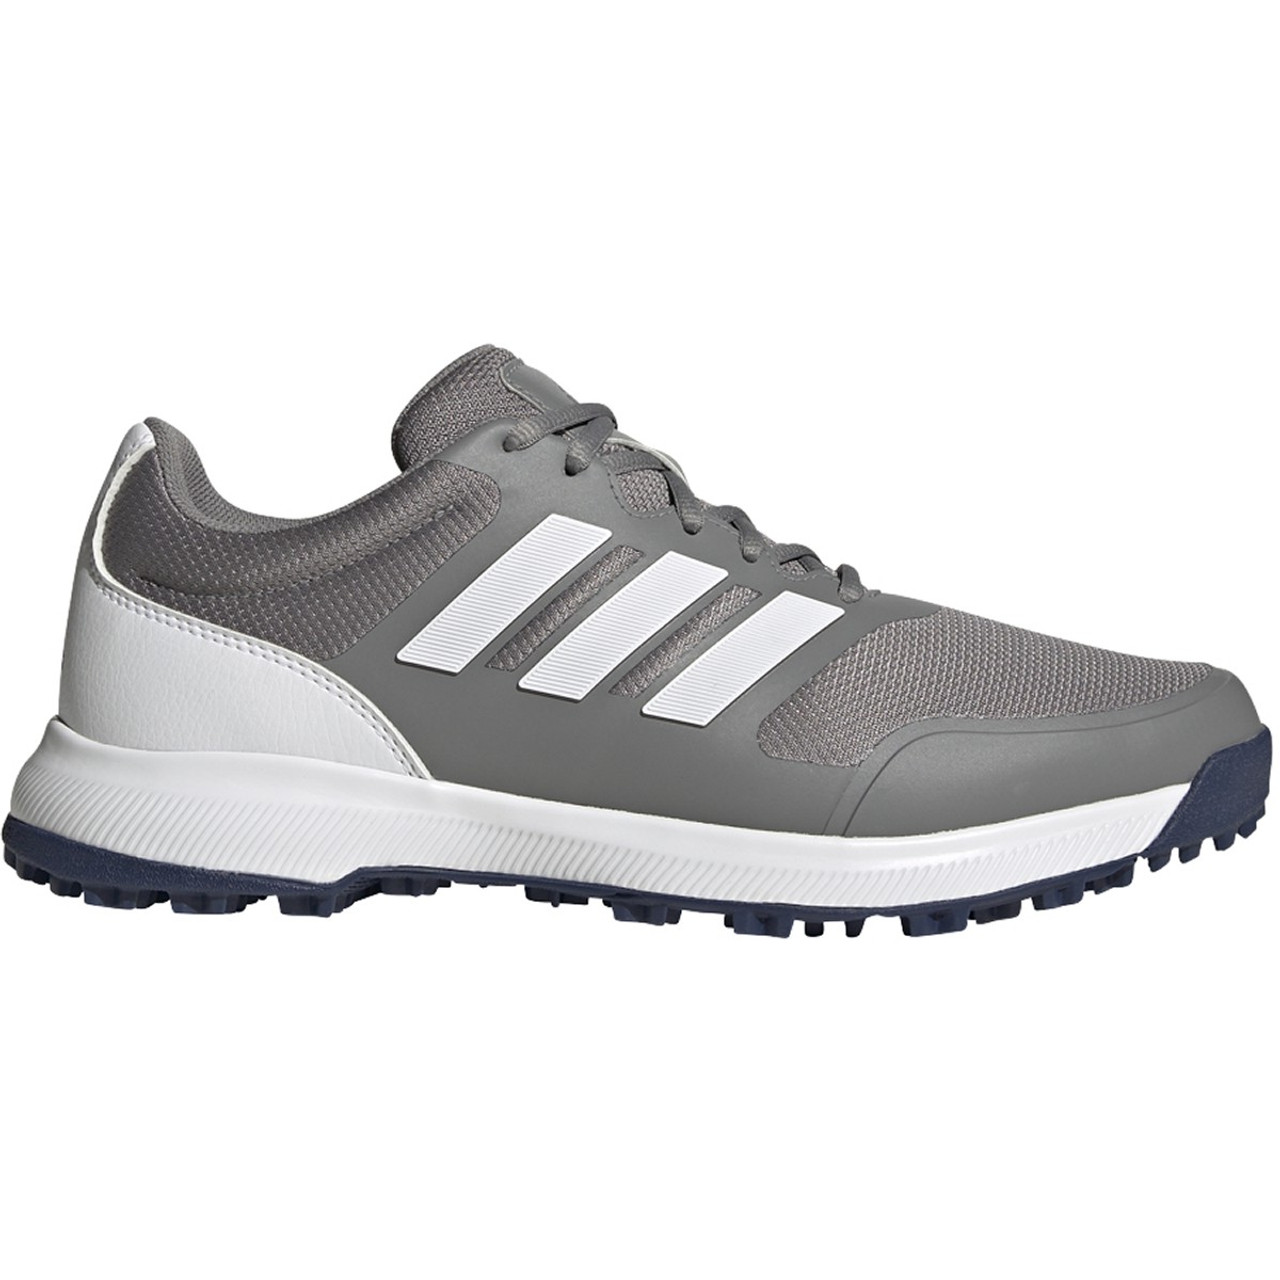 Adidas Tech Response Spikeless Golf Shoes - Grey Three / White